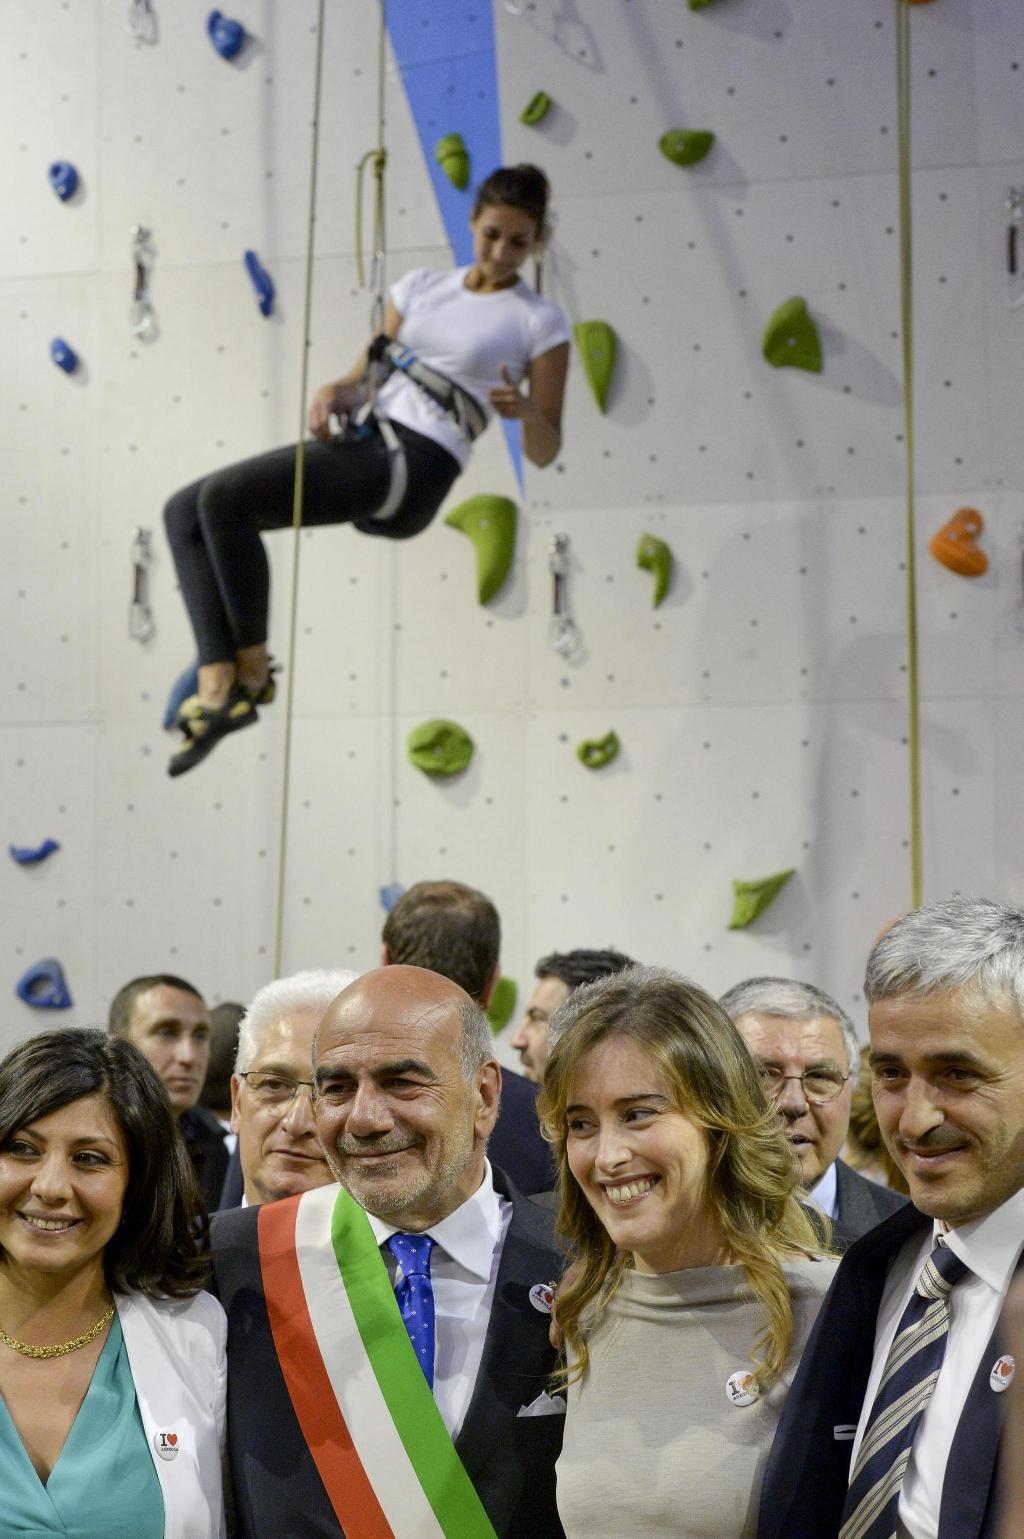 agerola indoor climbing wall maria elena boschi